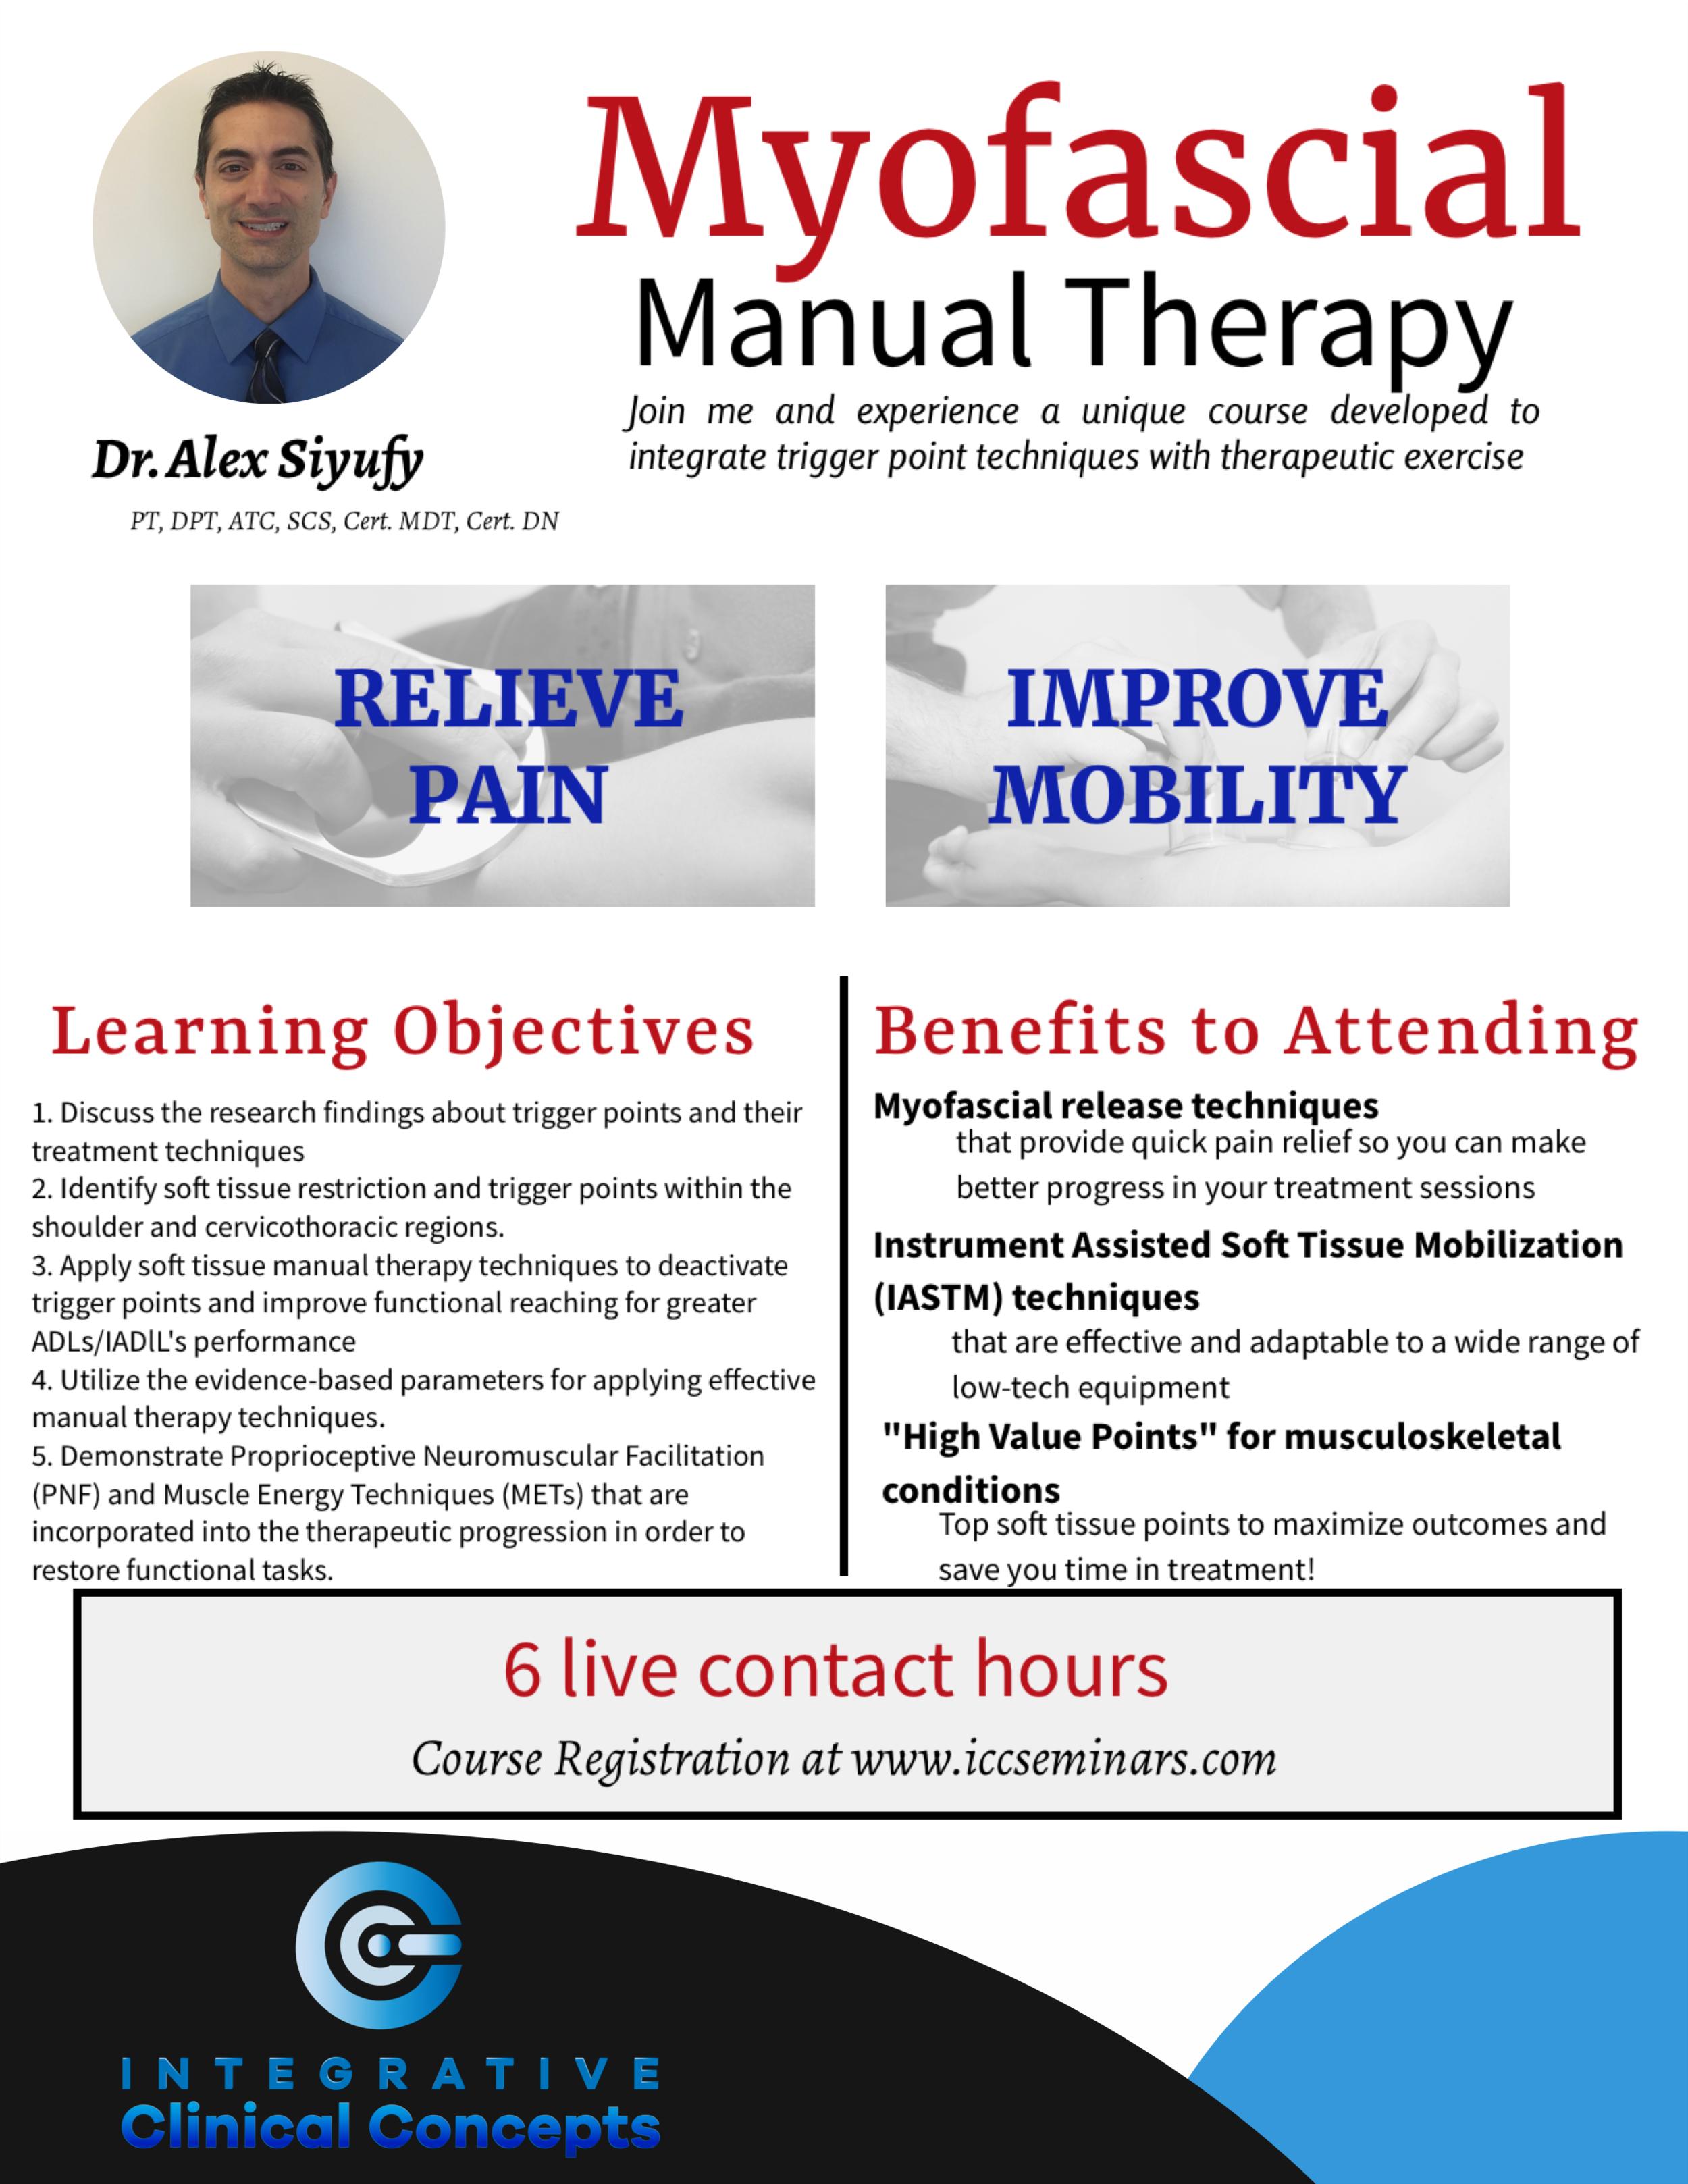 Myofascial manual therapy general.PNG